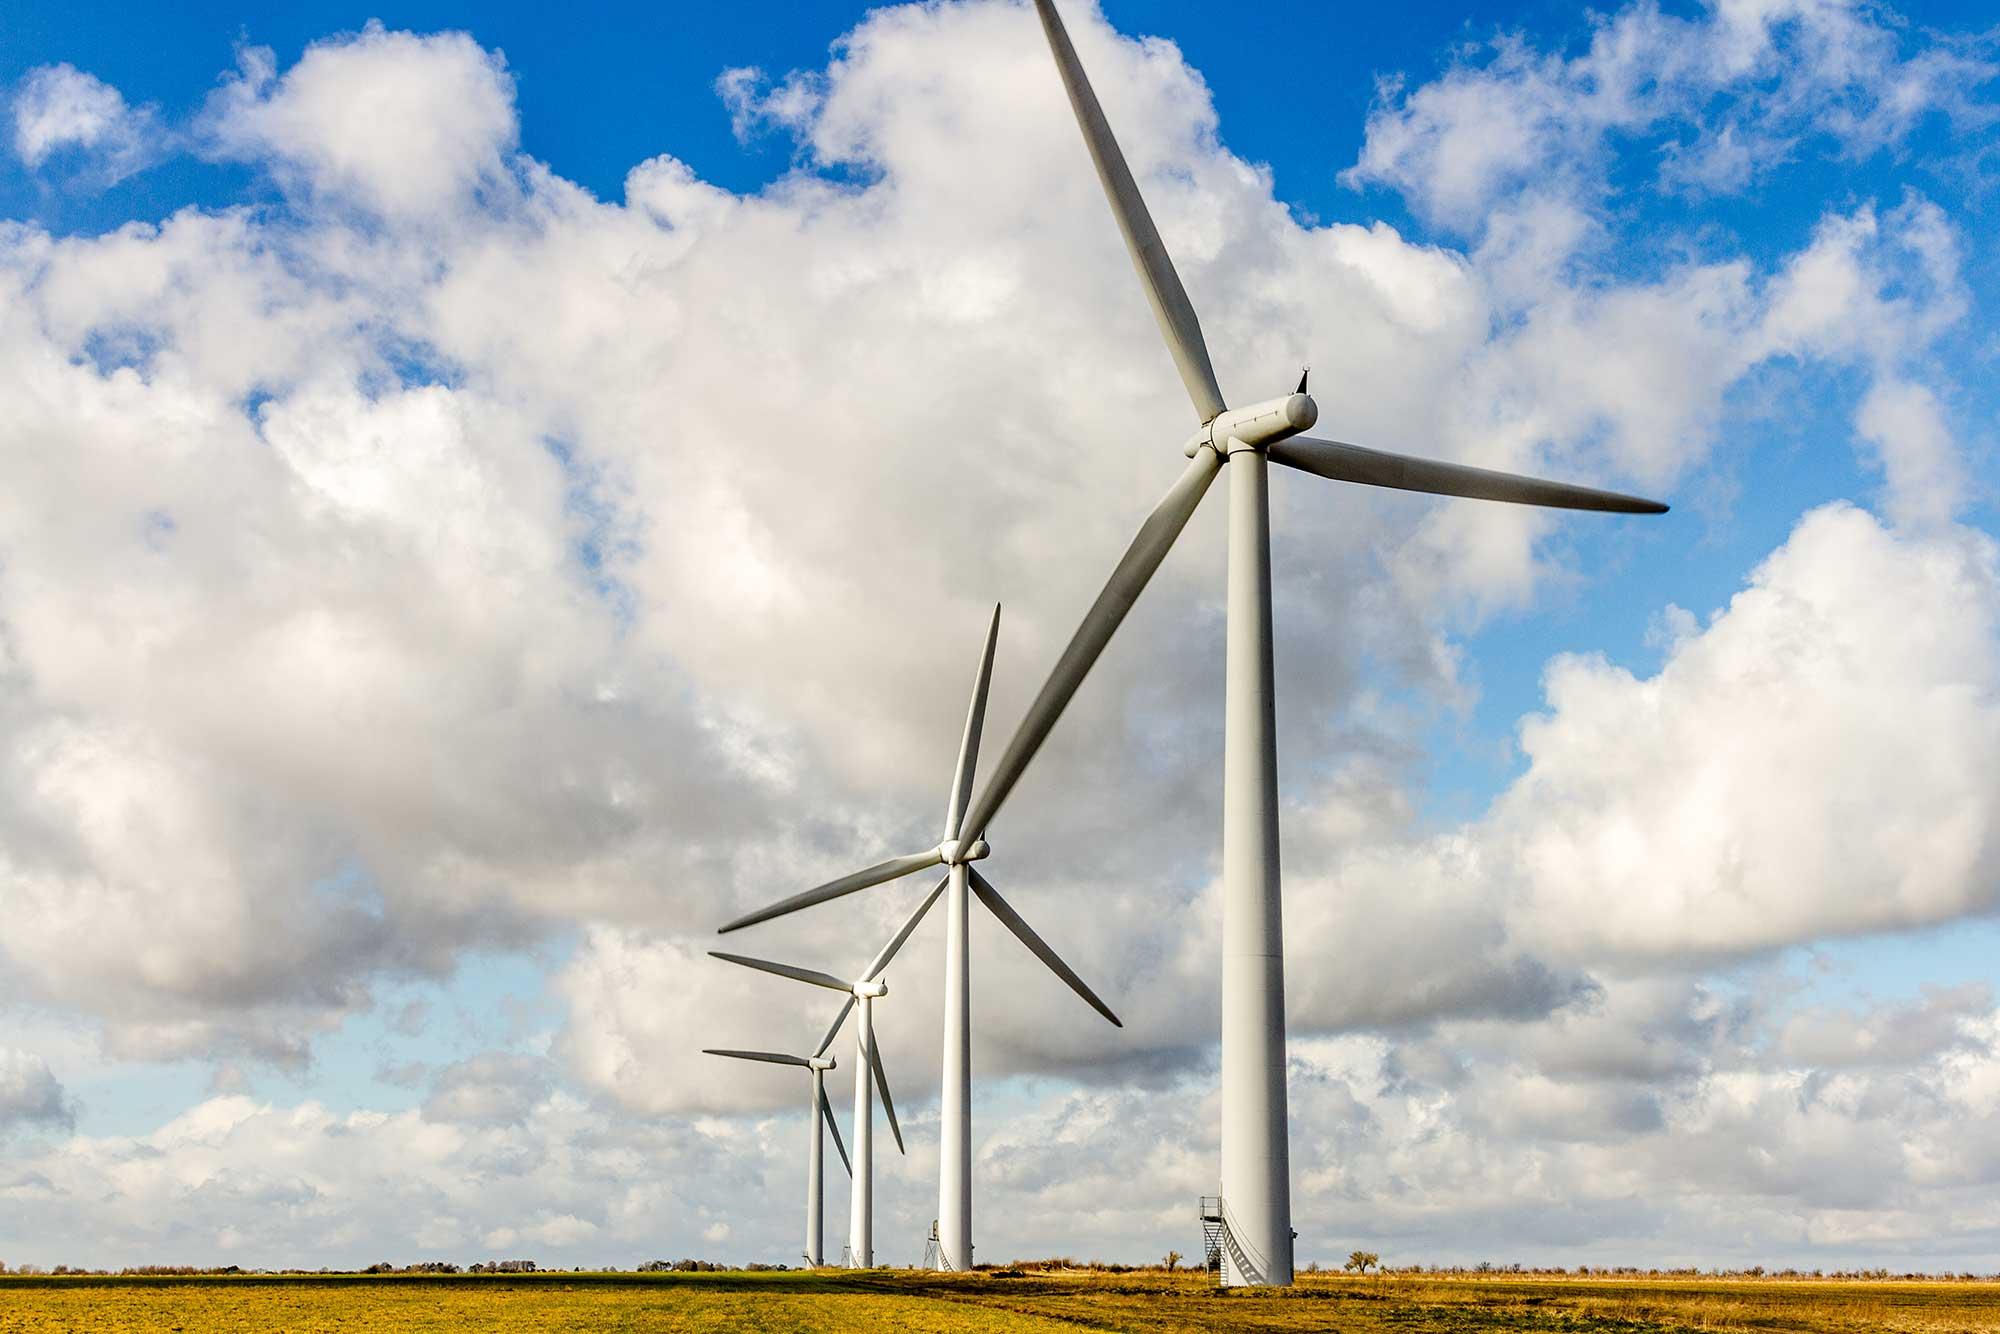 sop renewable energy engineering